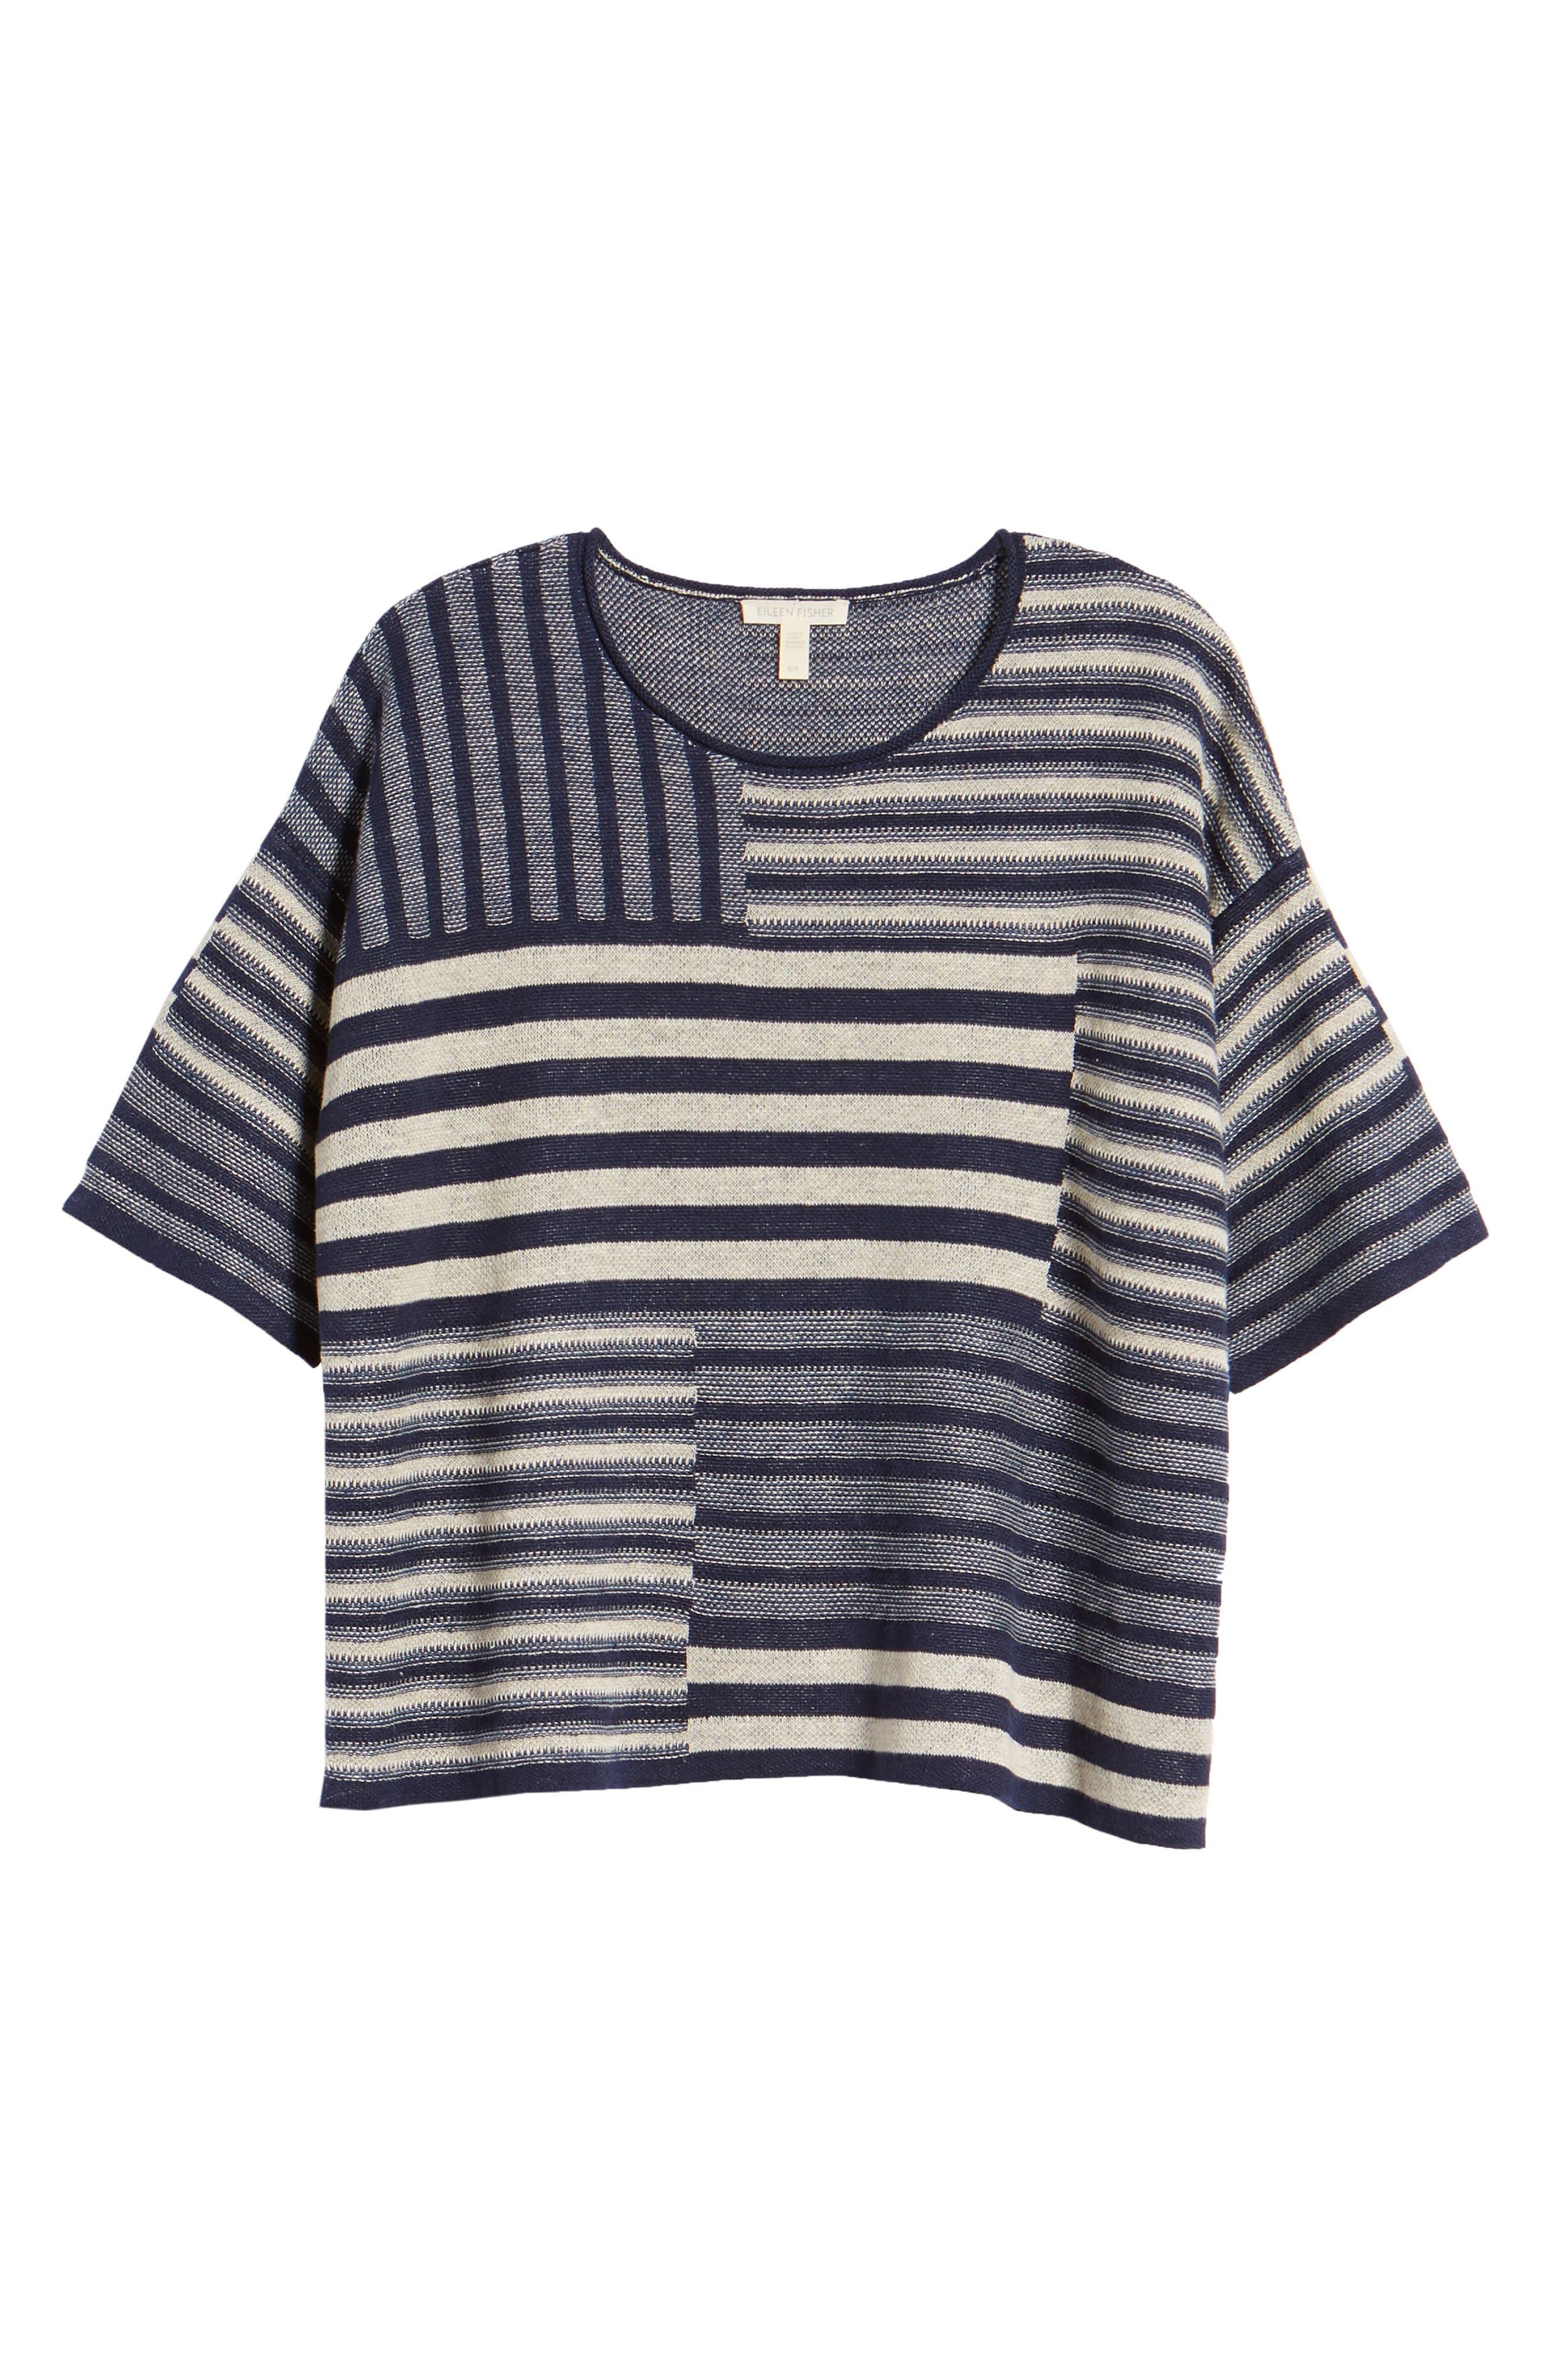 Mixed Stripe Organic Linen Top,                             Alternate thumbnail 7, color,                             Denim